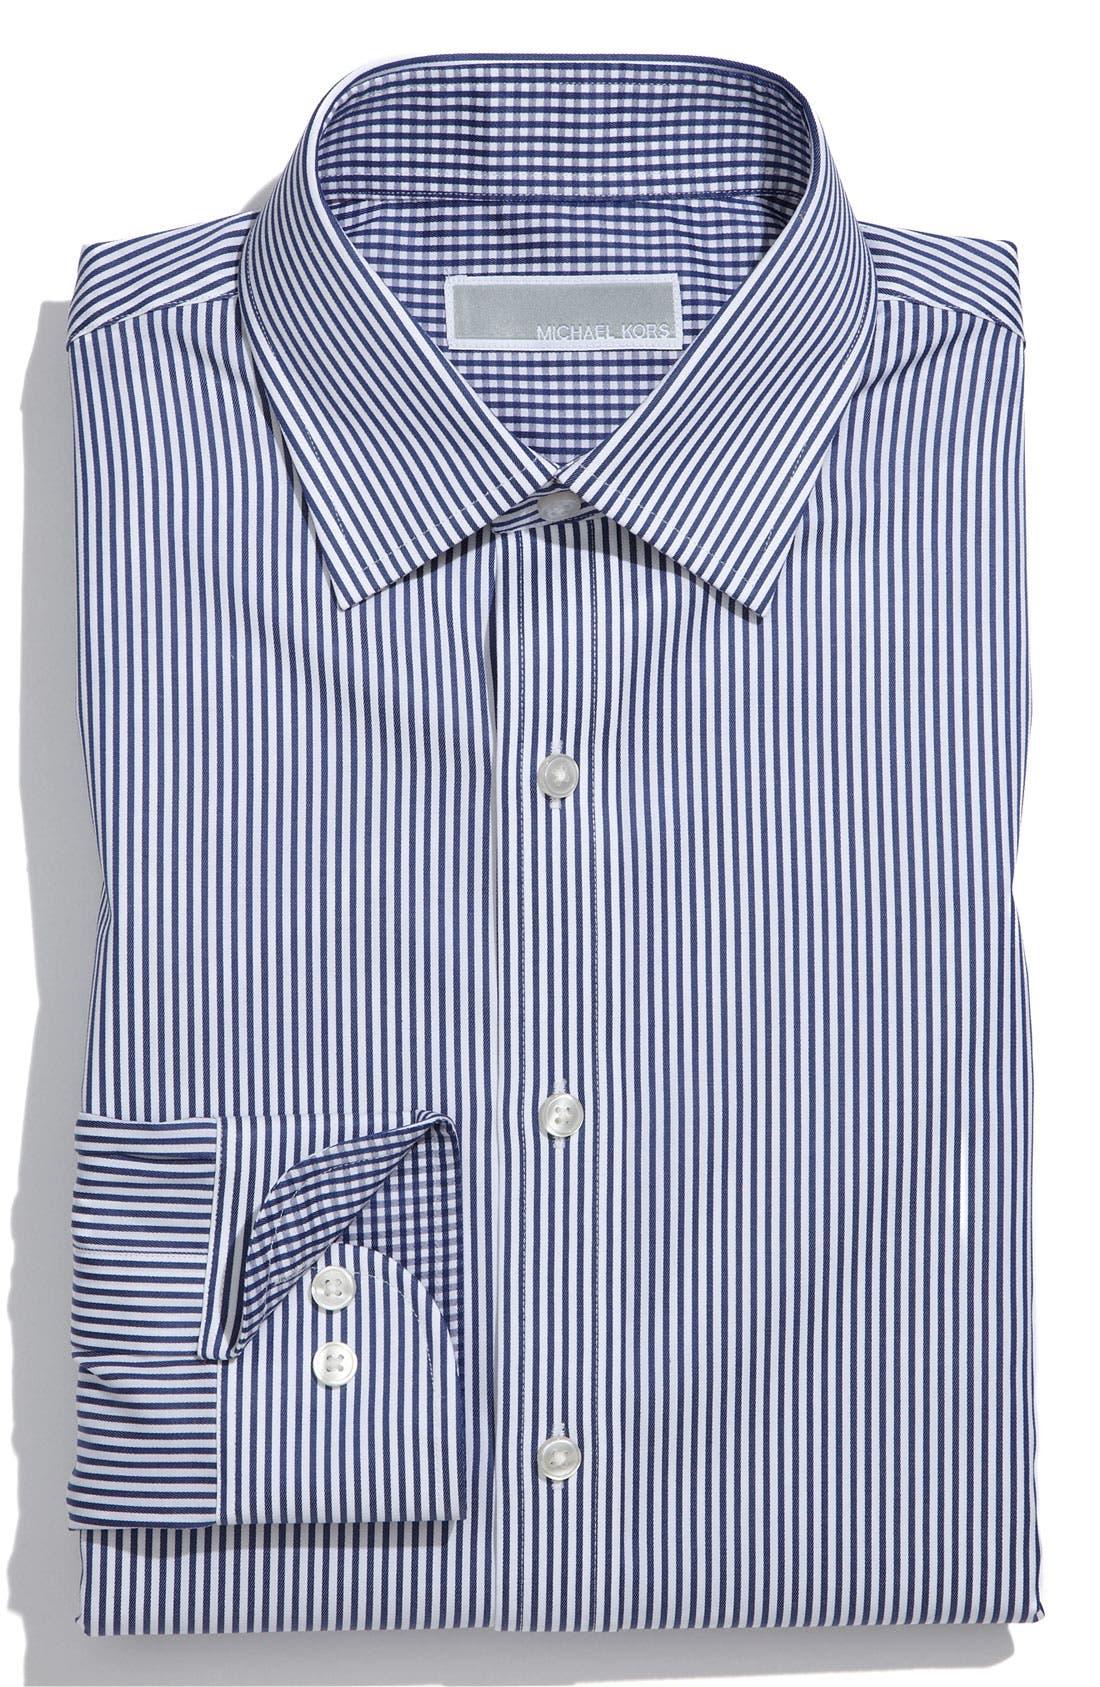 Regular Fit Dress Shirt,                             Main thumbnail 1, color,                             415